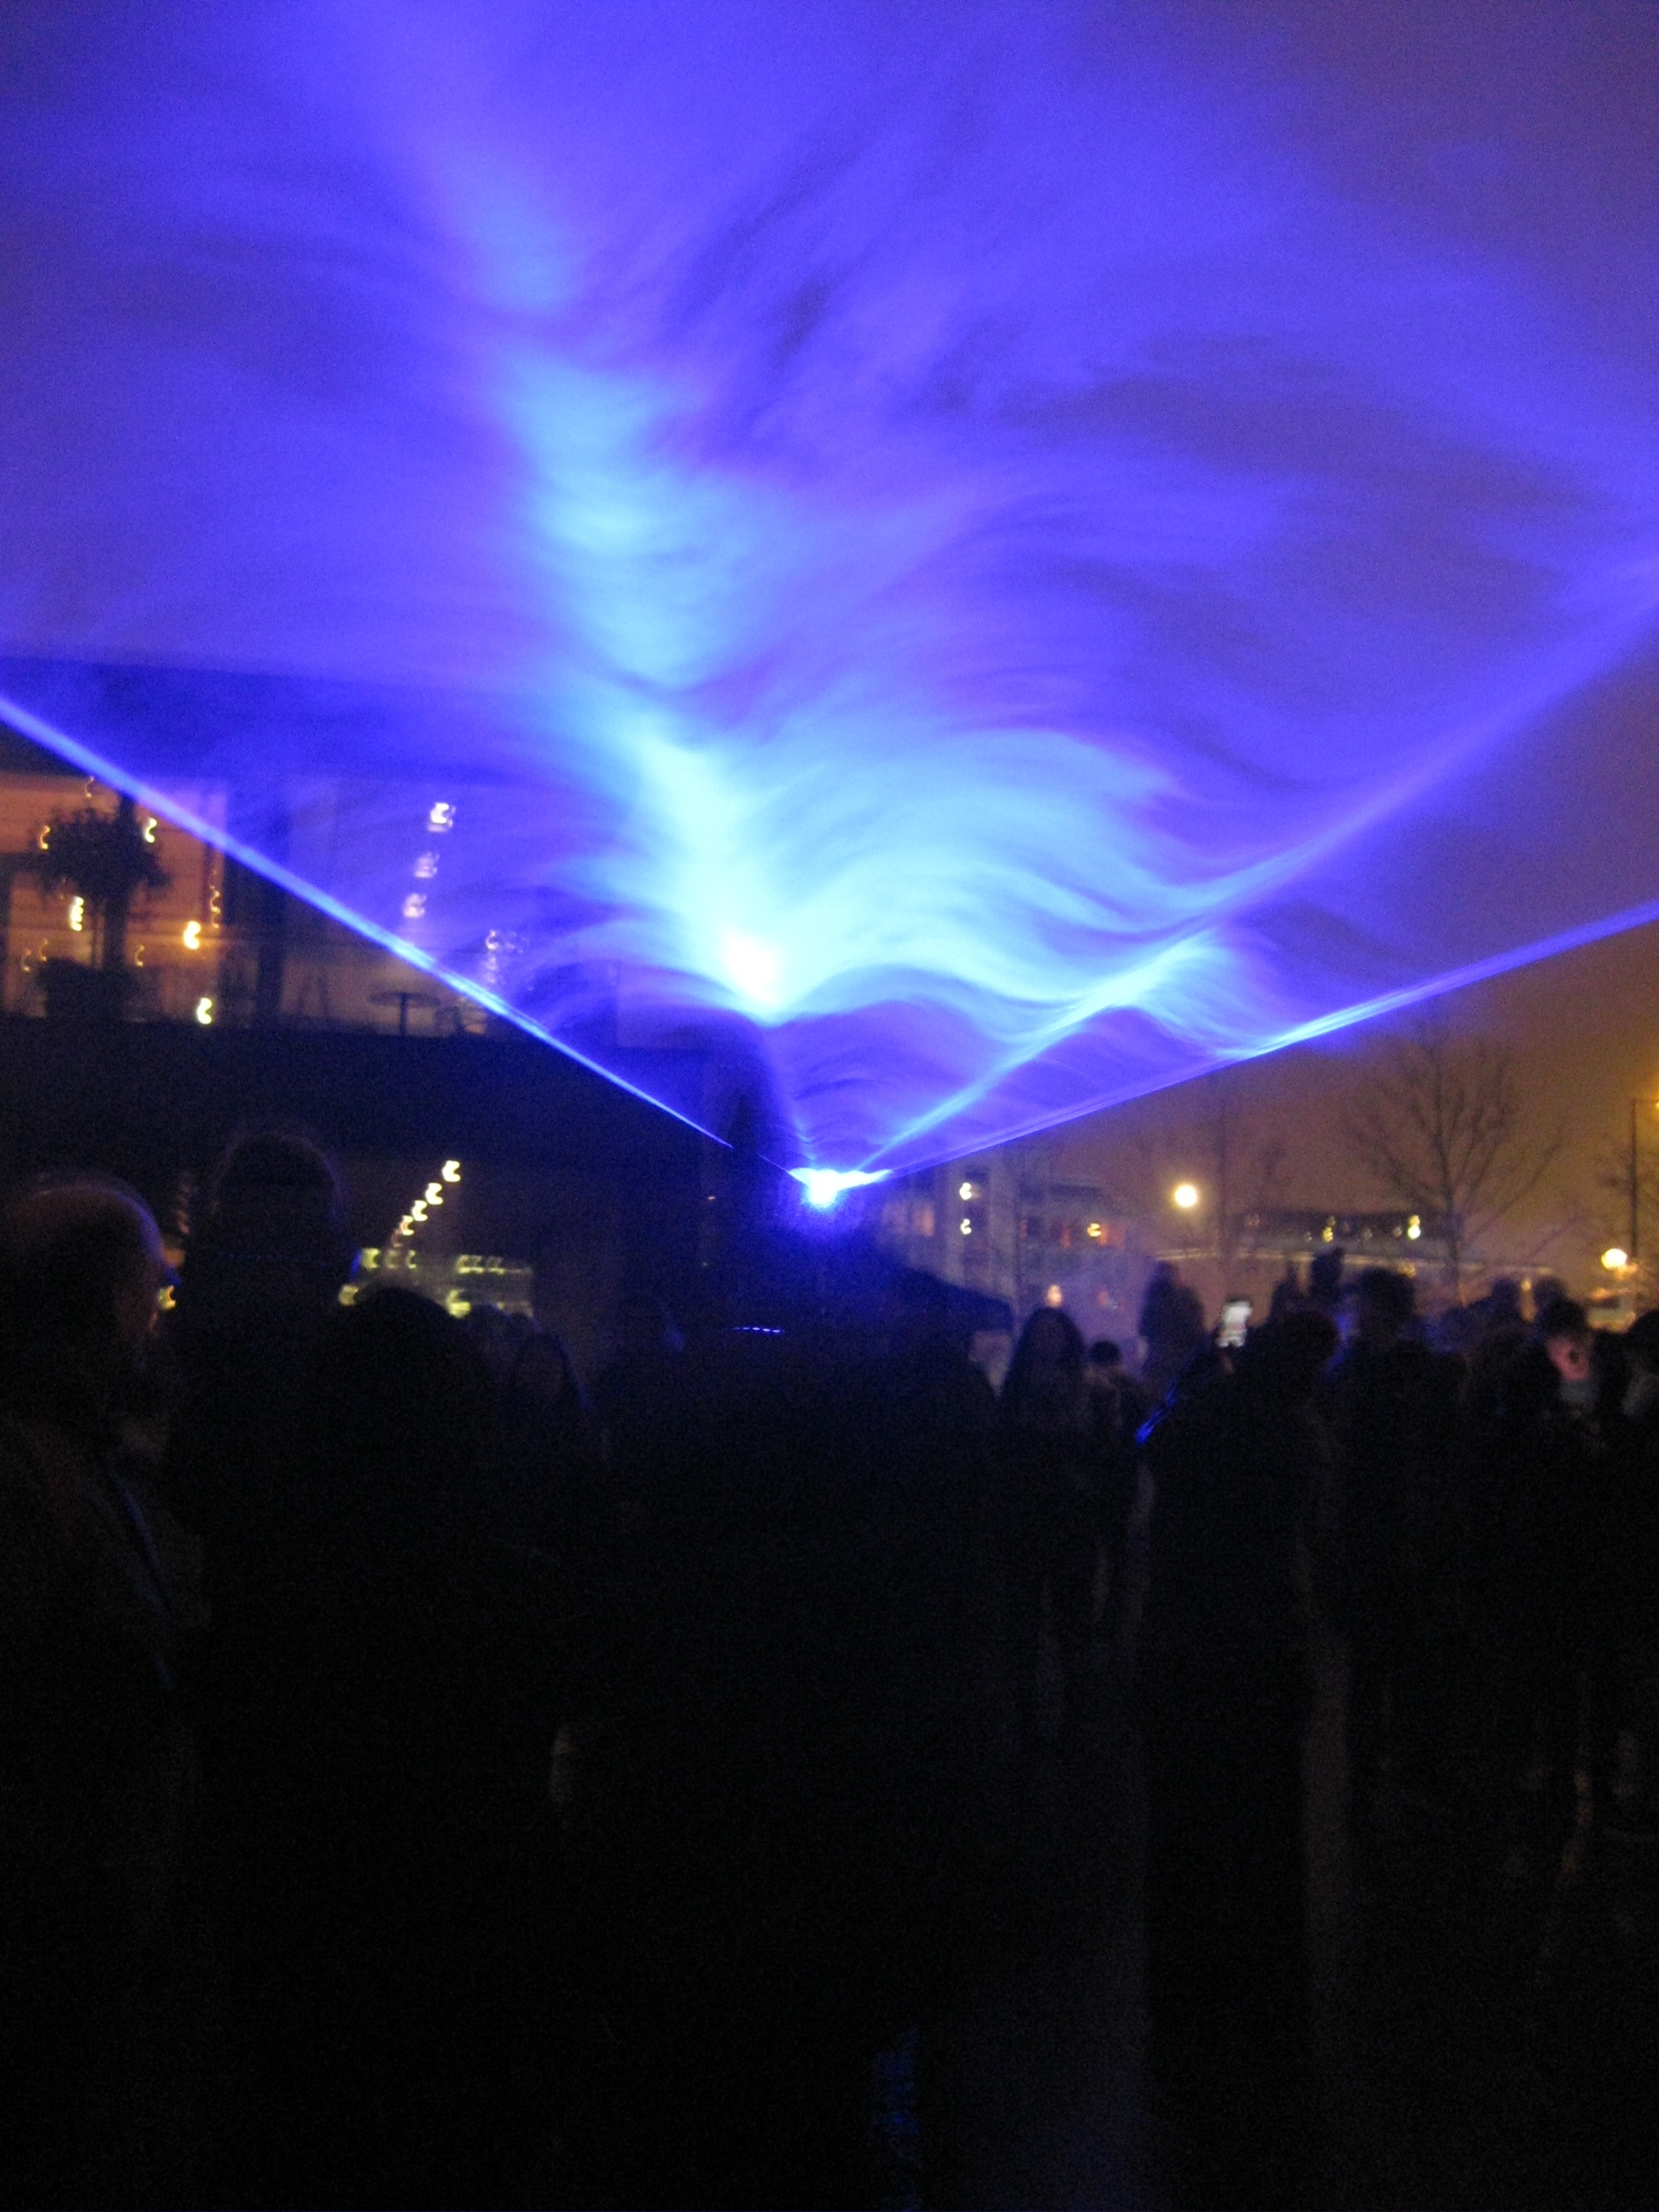 Waterlicht at Lumiere London. Photo by Caroline Banks